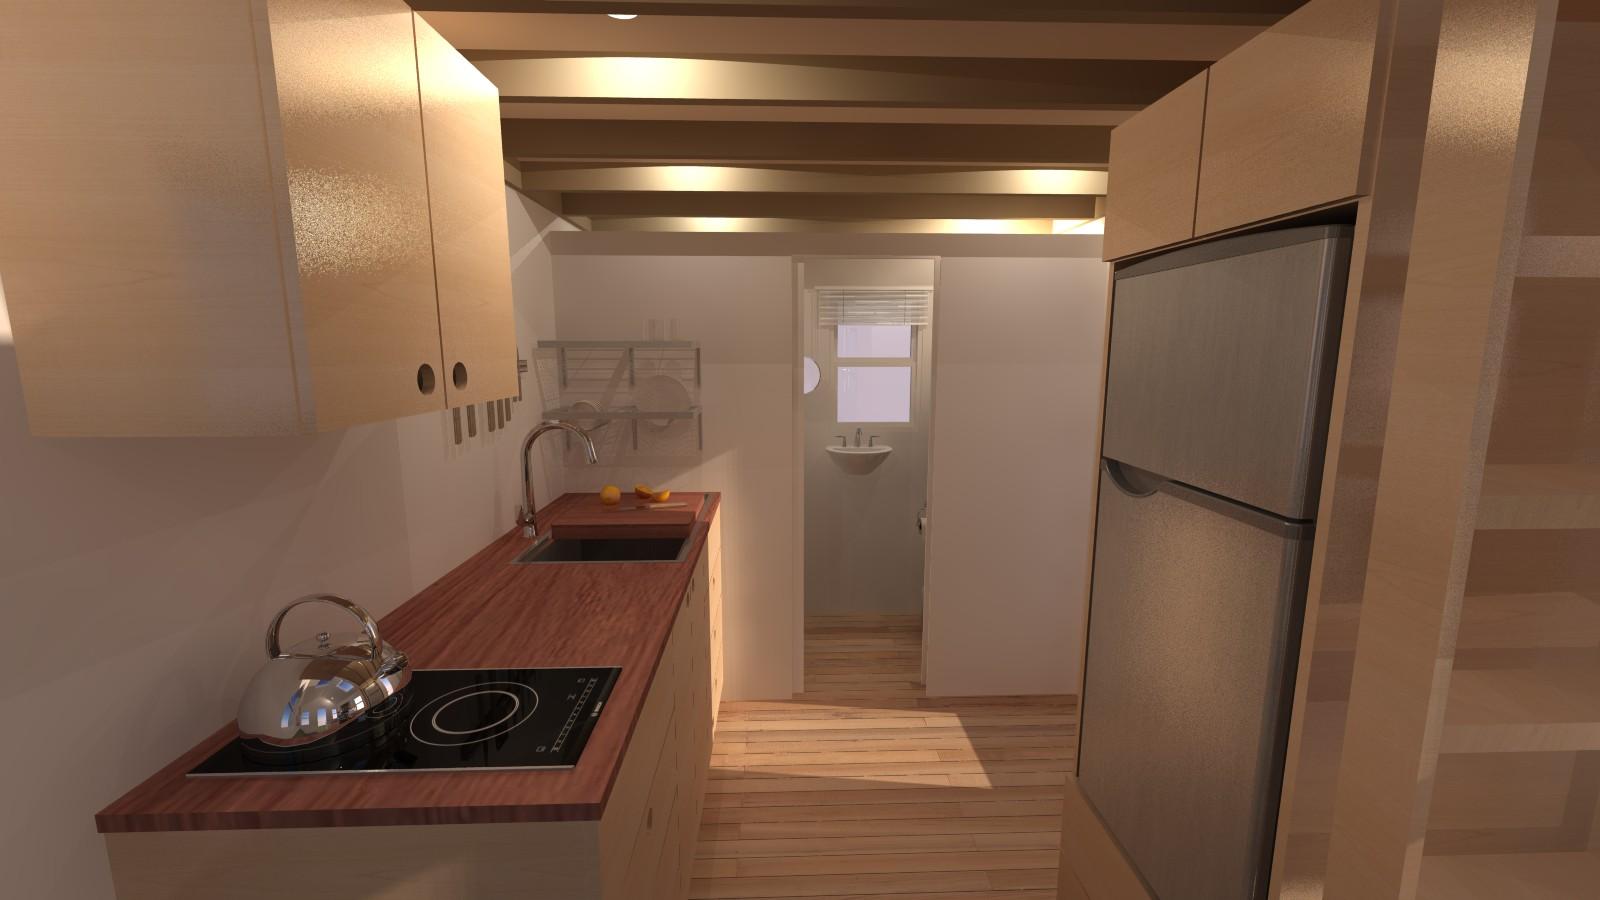 pella kitchen windows paula deen table 18 tiny house designs - design